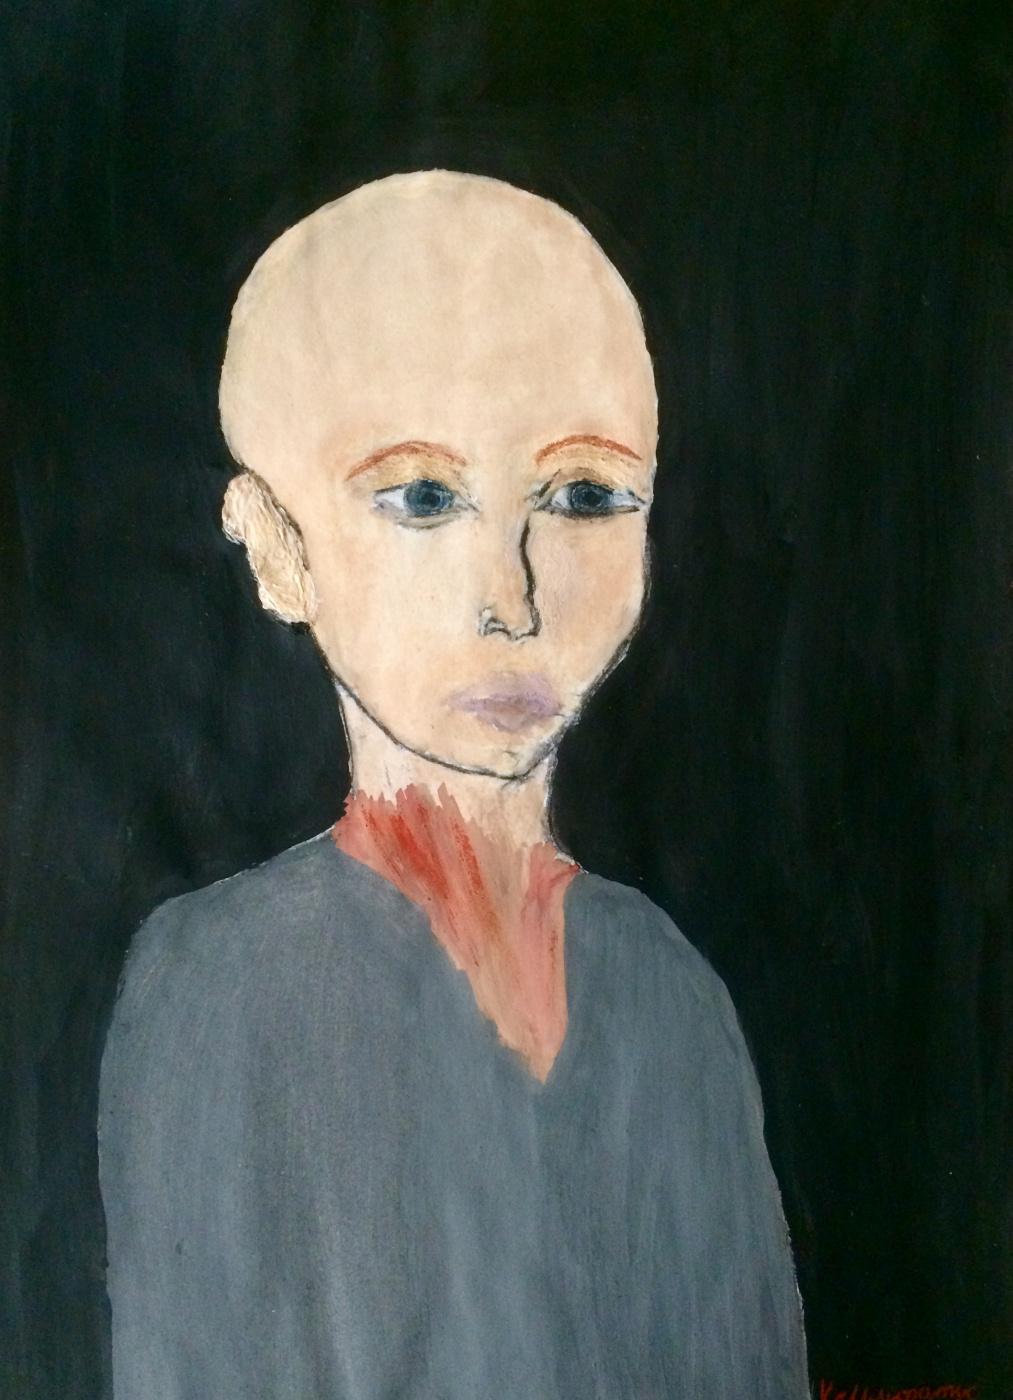 Arne Kelmfatus. An orphan